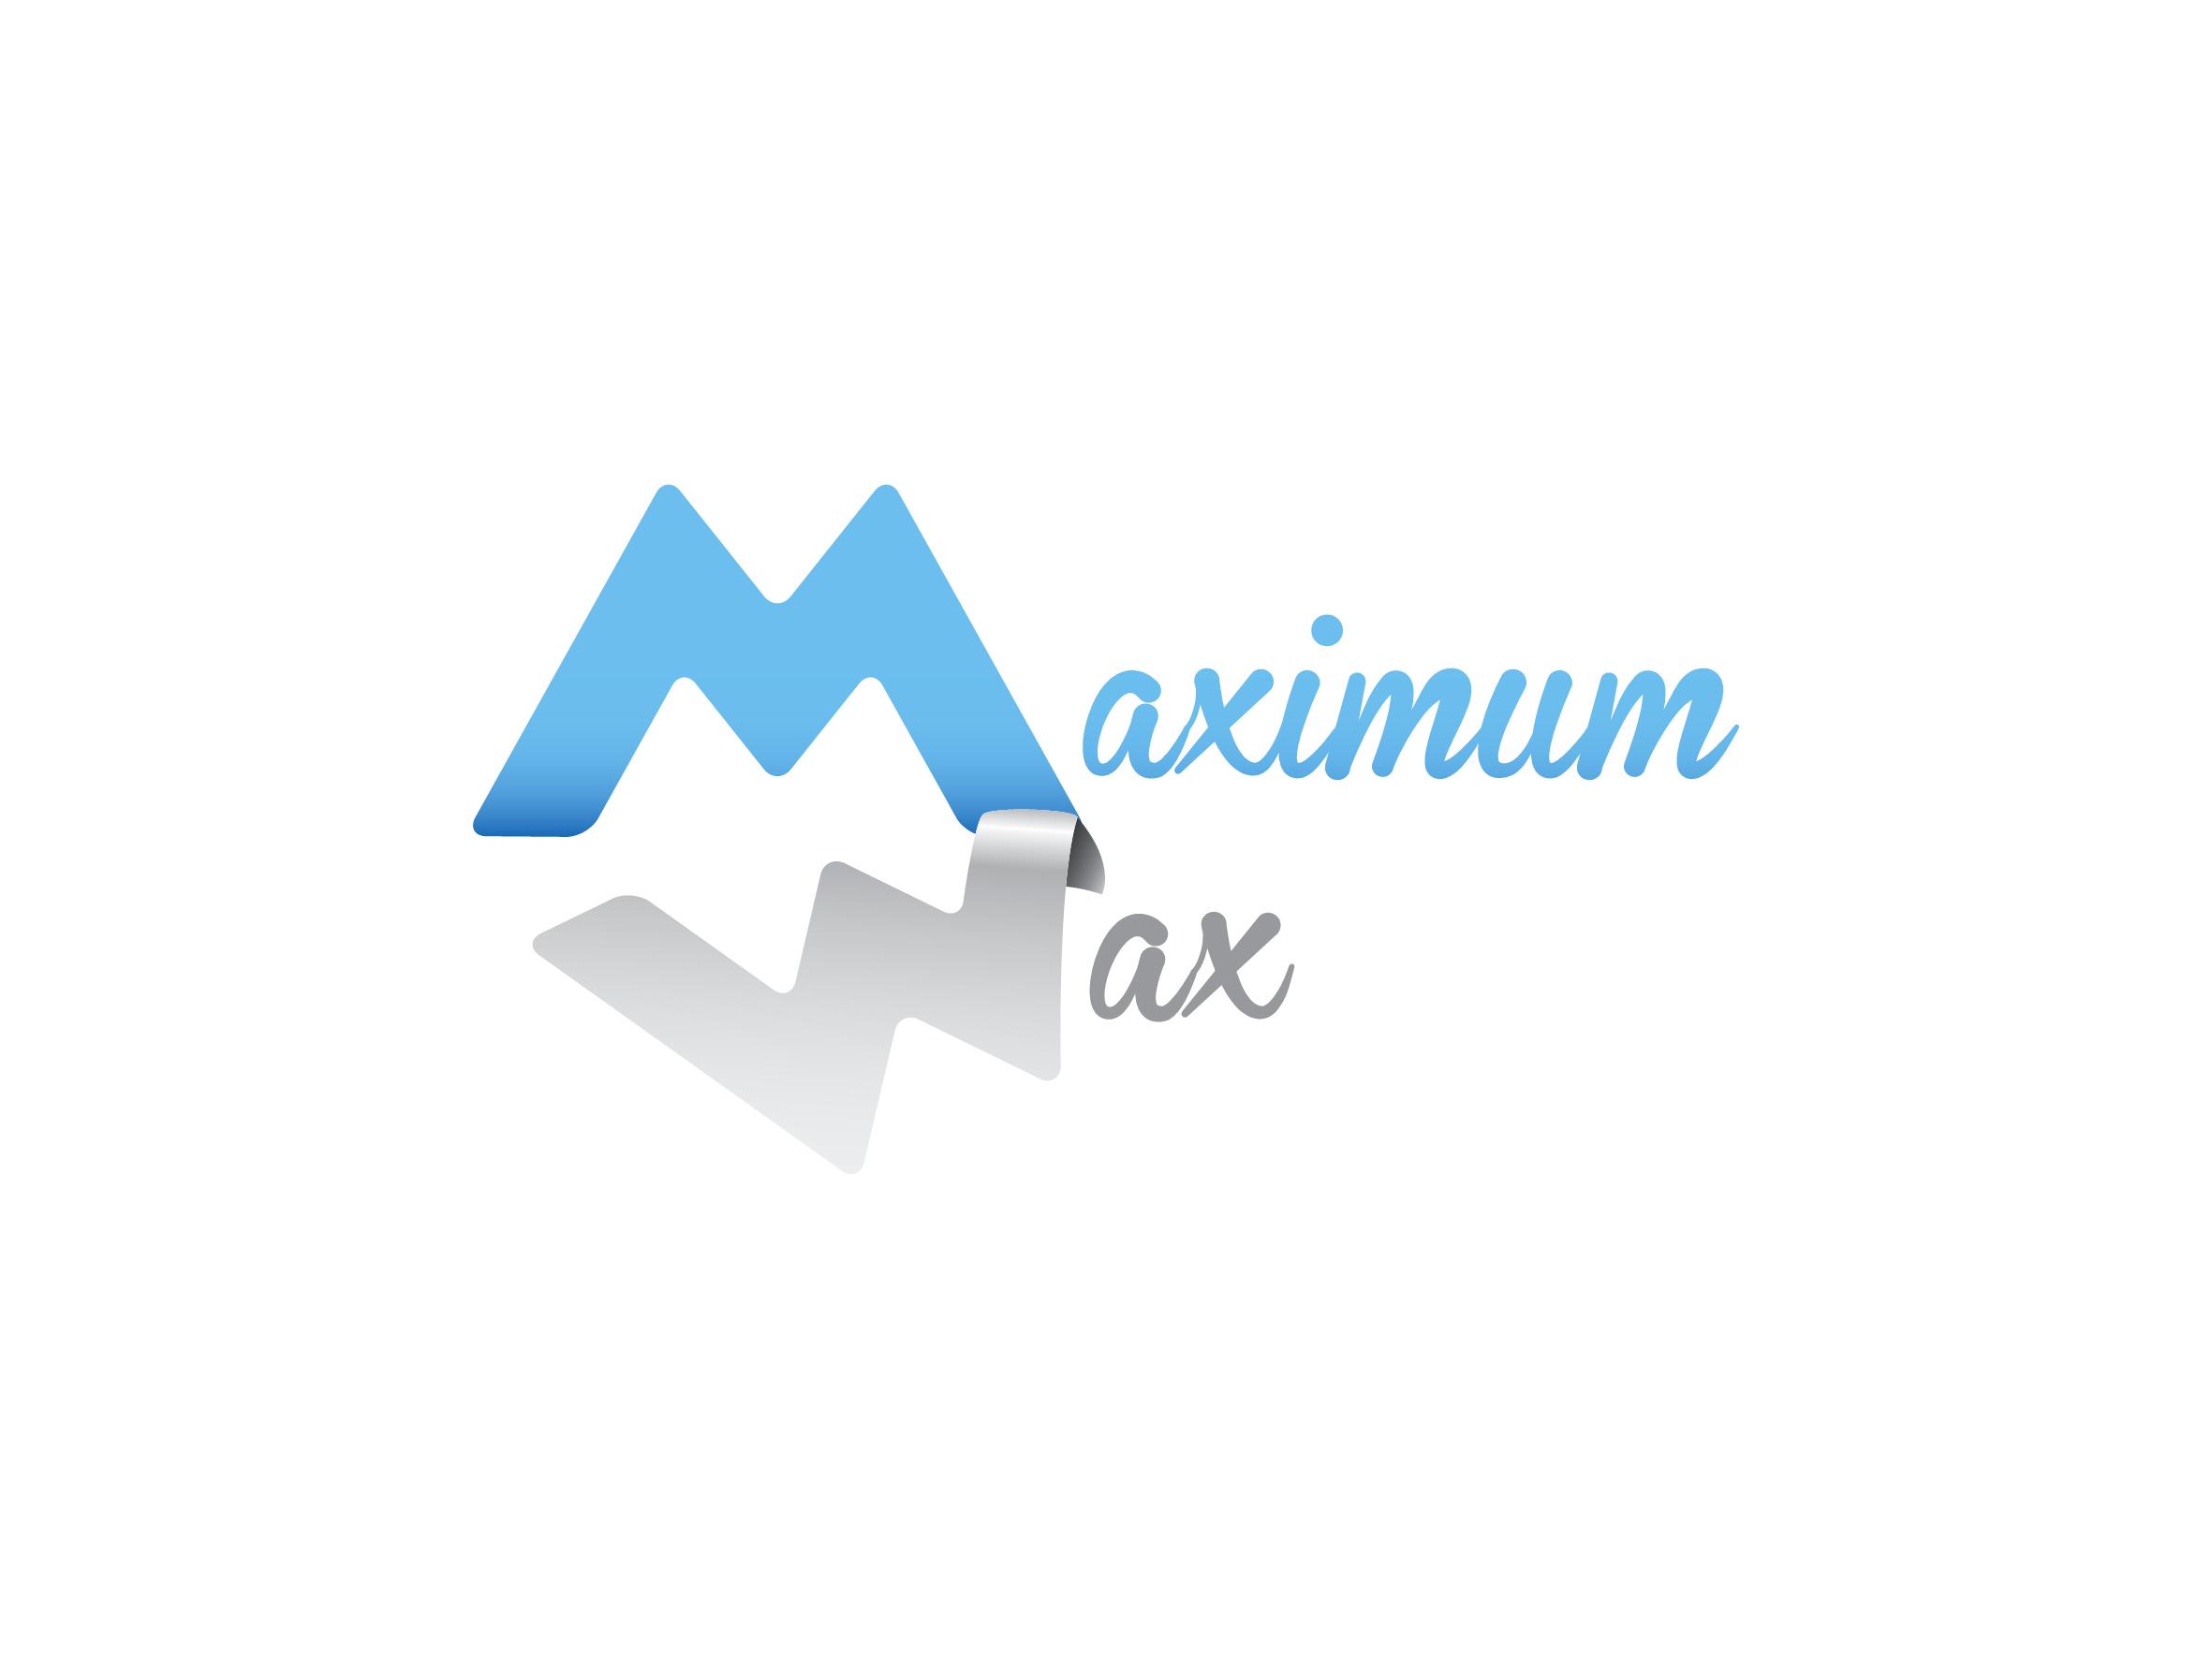 maximum wax leeds waxing logo design designed by Dakini Design Saltaire, Shipley, Bradford